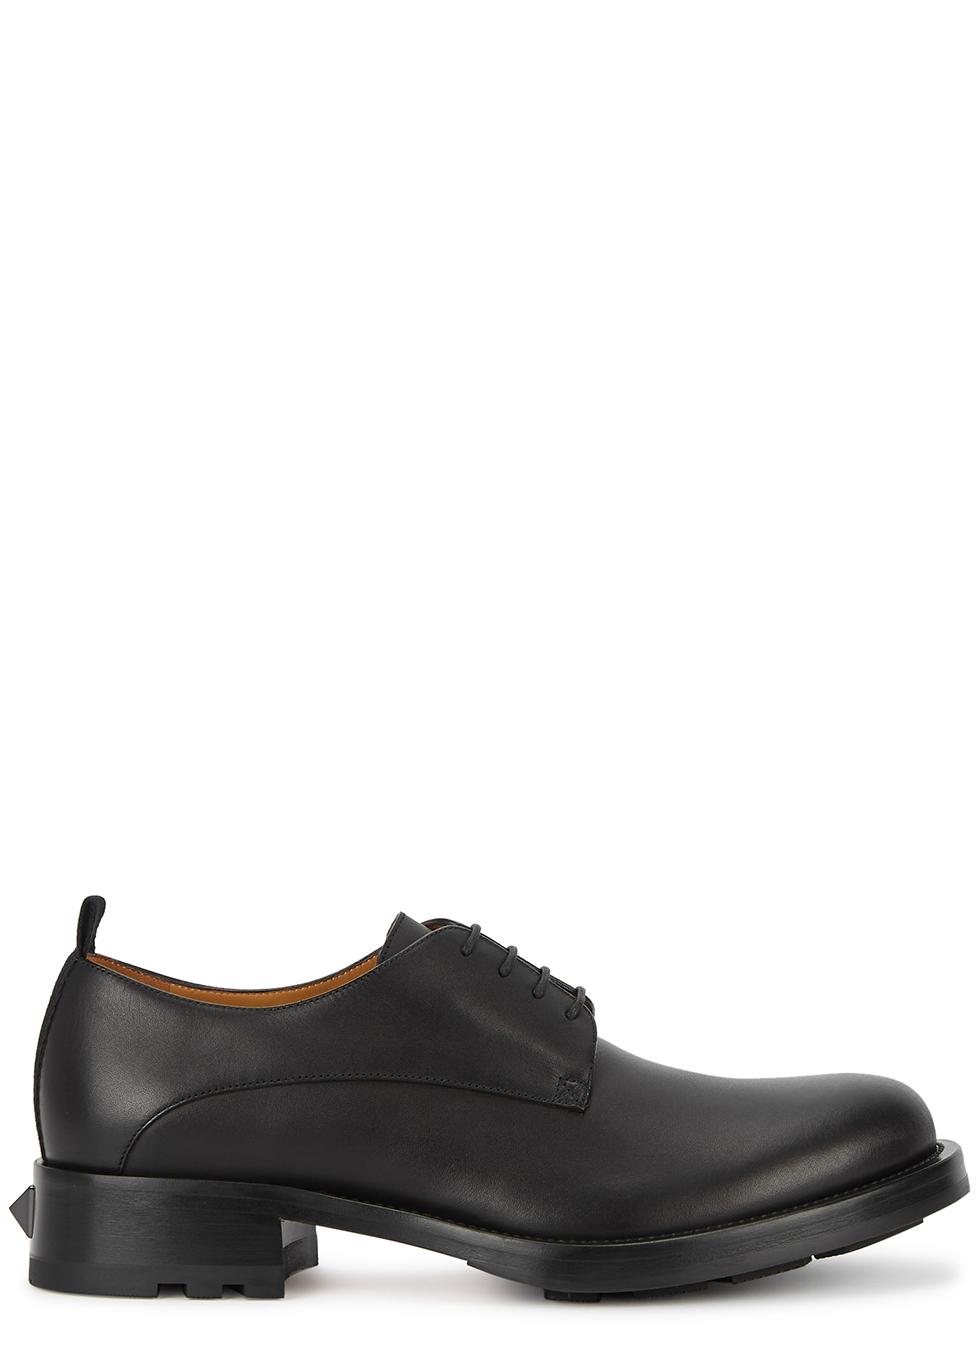 Valentino Garavani black leather Derby shoes